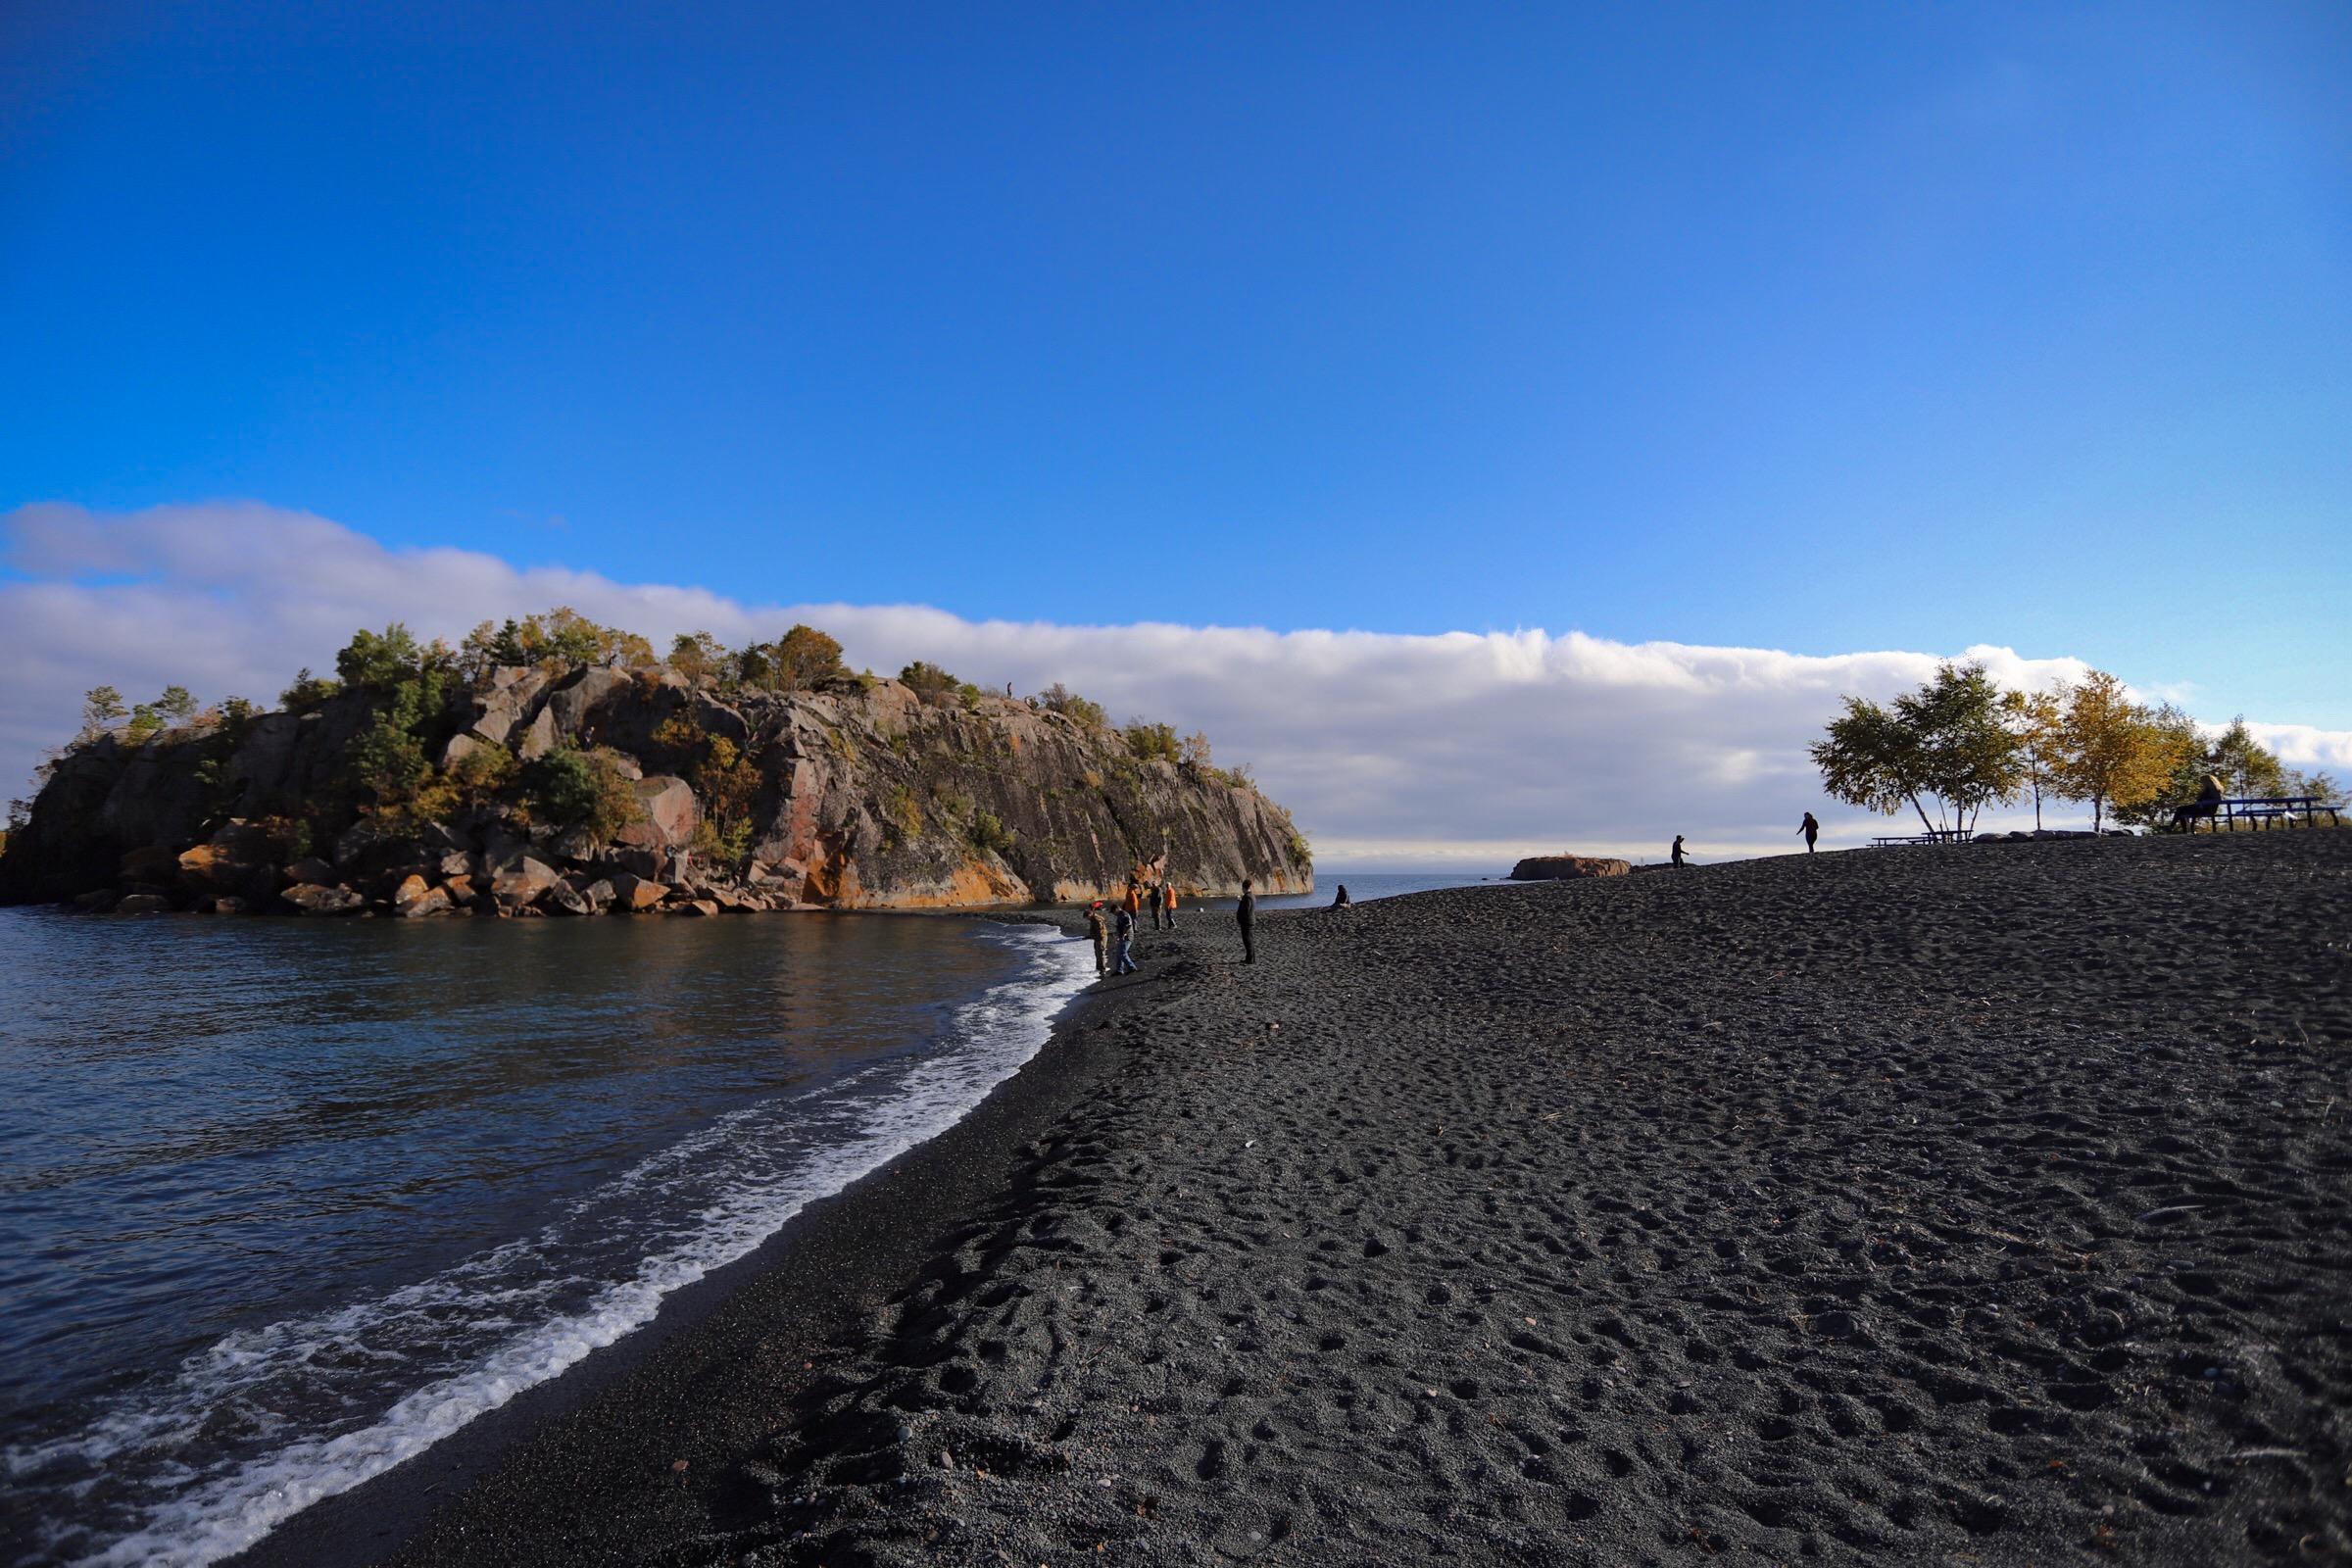 october 7, 2017  onyx beach - silver bay, minnesota